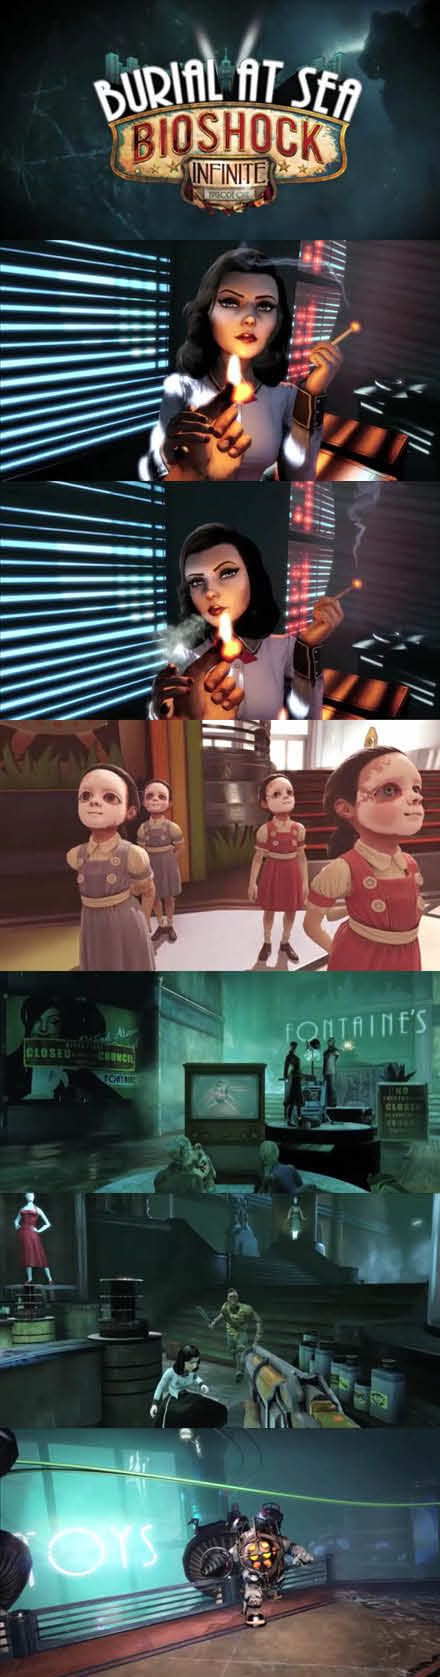 #BioshockInfinite #BurialatSea Episode One Discover a new story of Elizabeth…